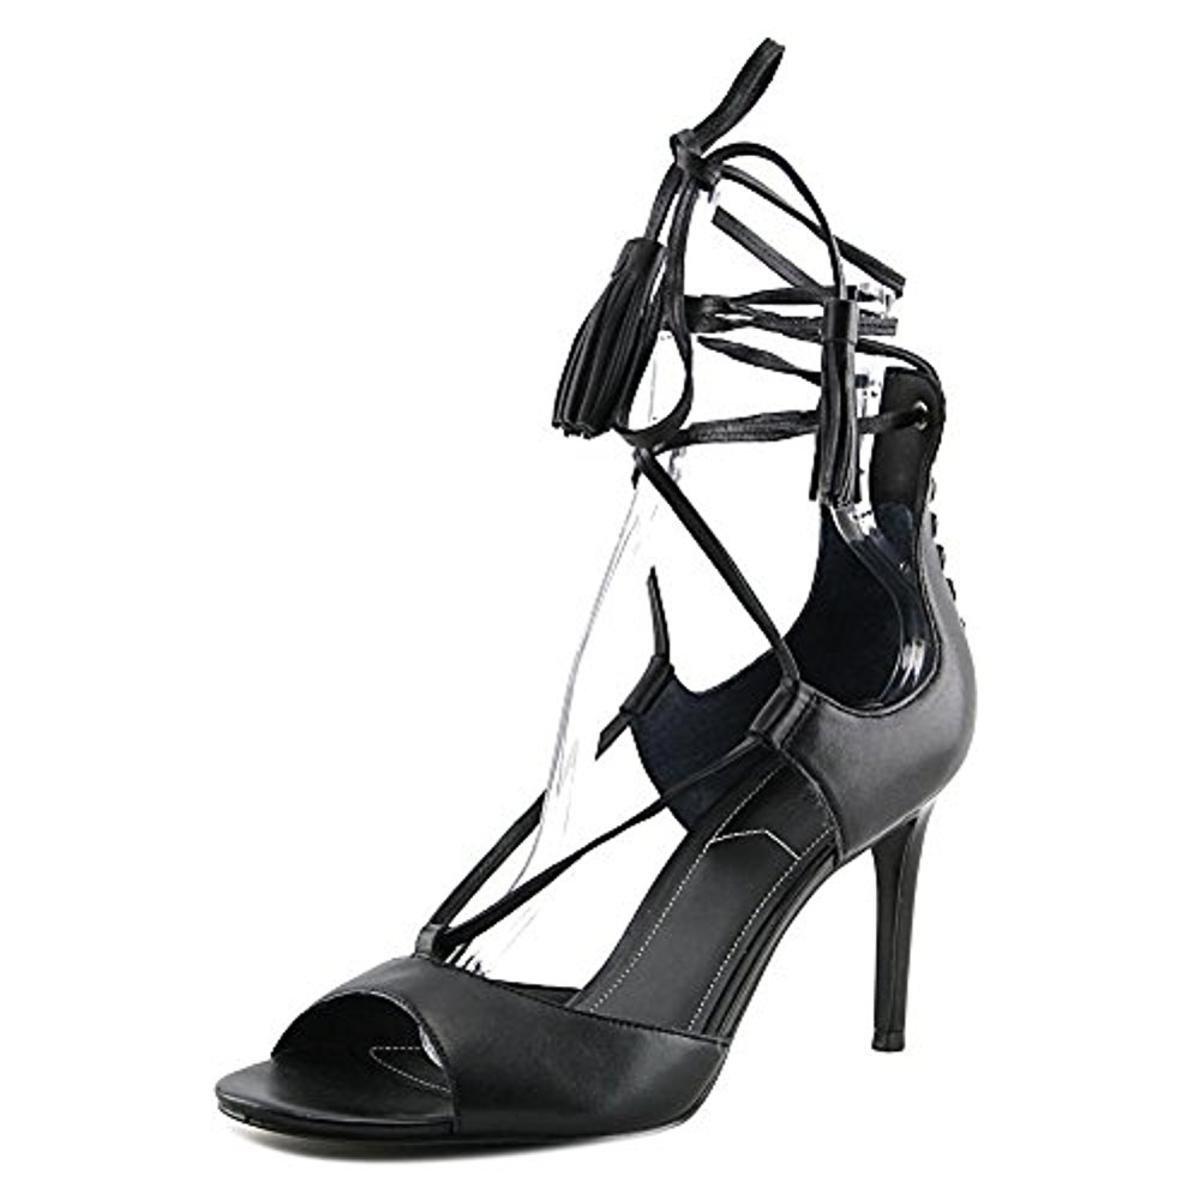 KENDALL + KYLIE Womens Mira Sued Lace-Up Dress Heels Black 8 Medium (B,M)